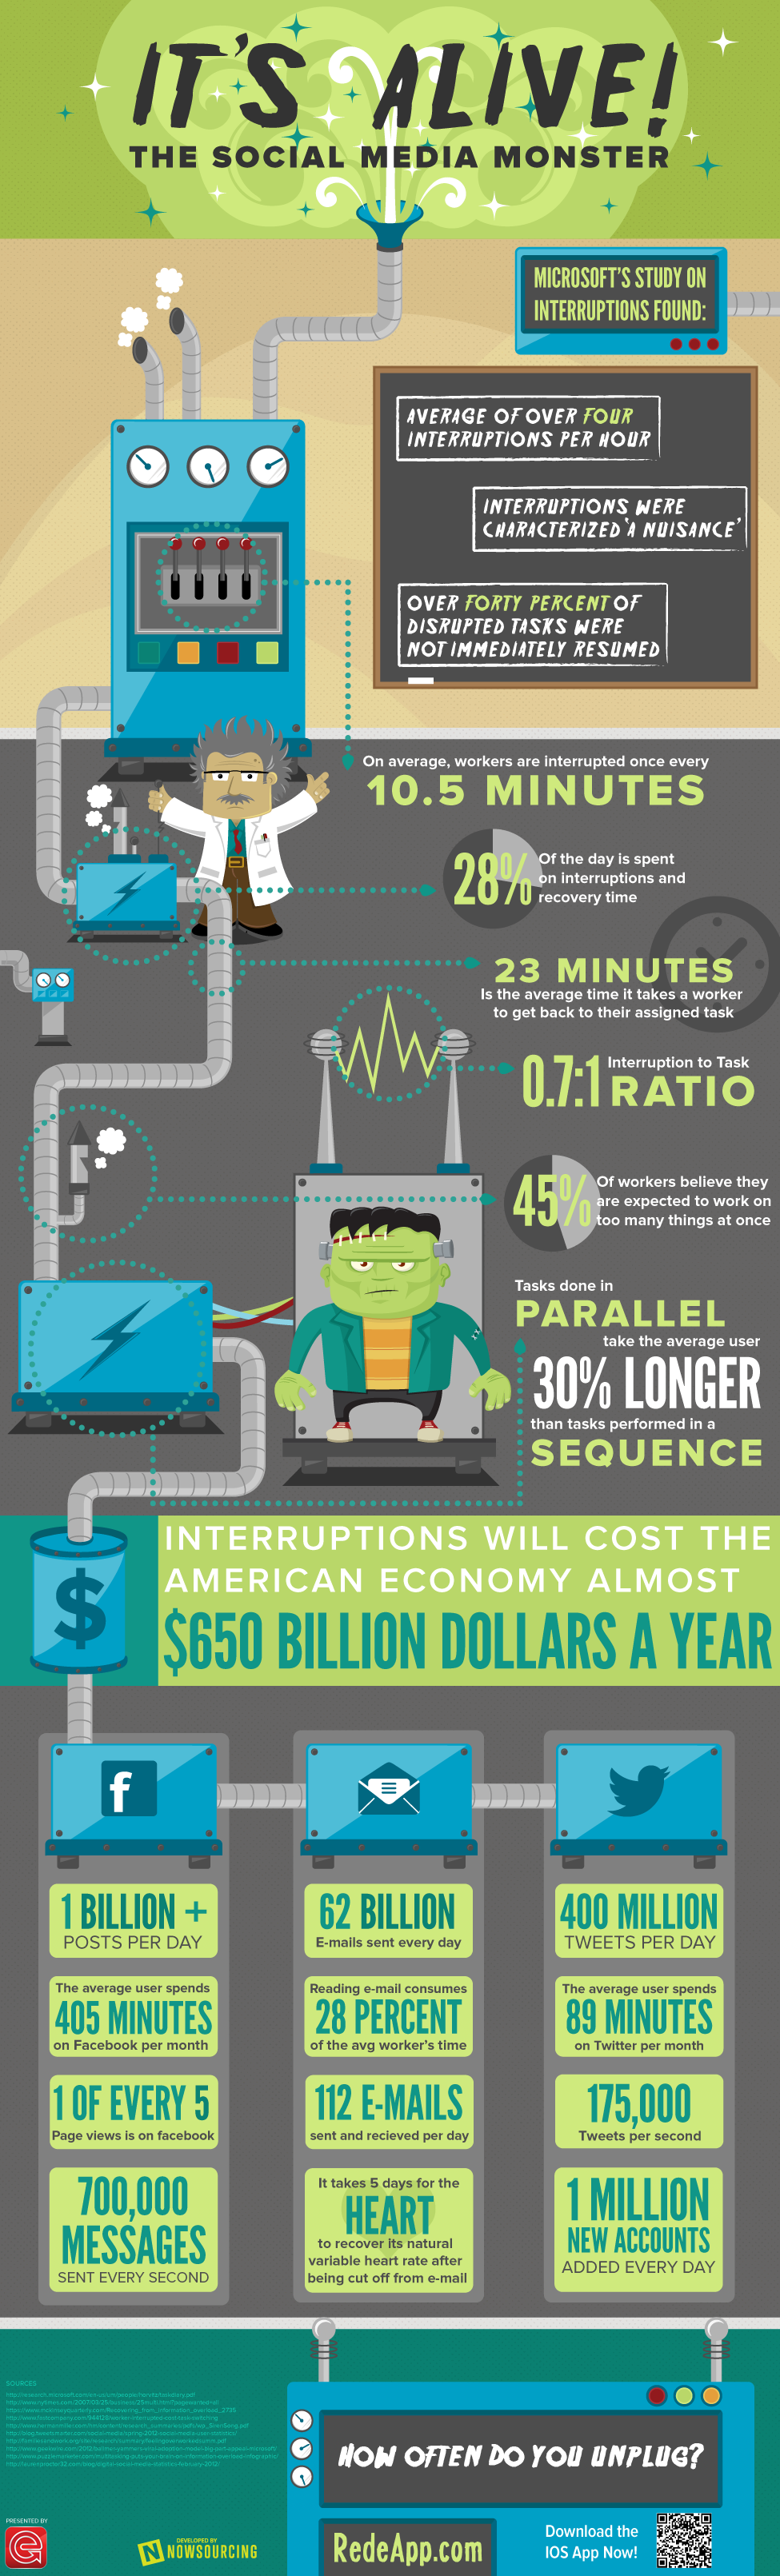 social-media-monster-infographic.png